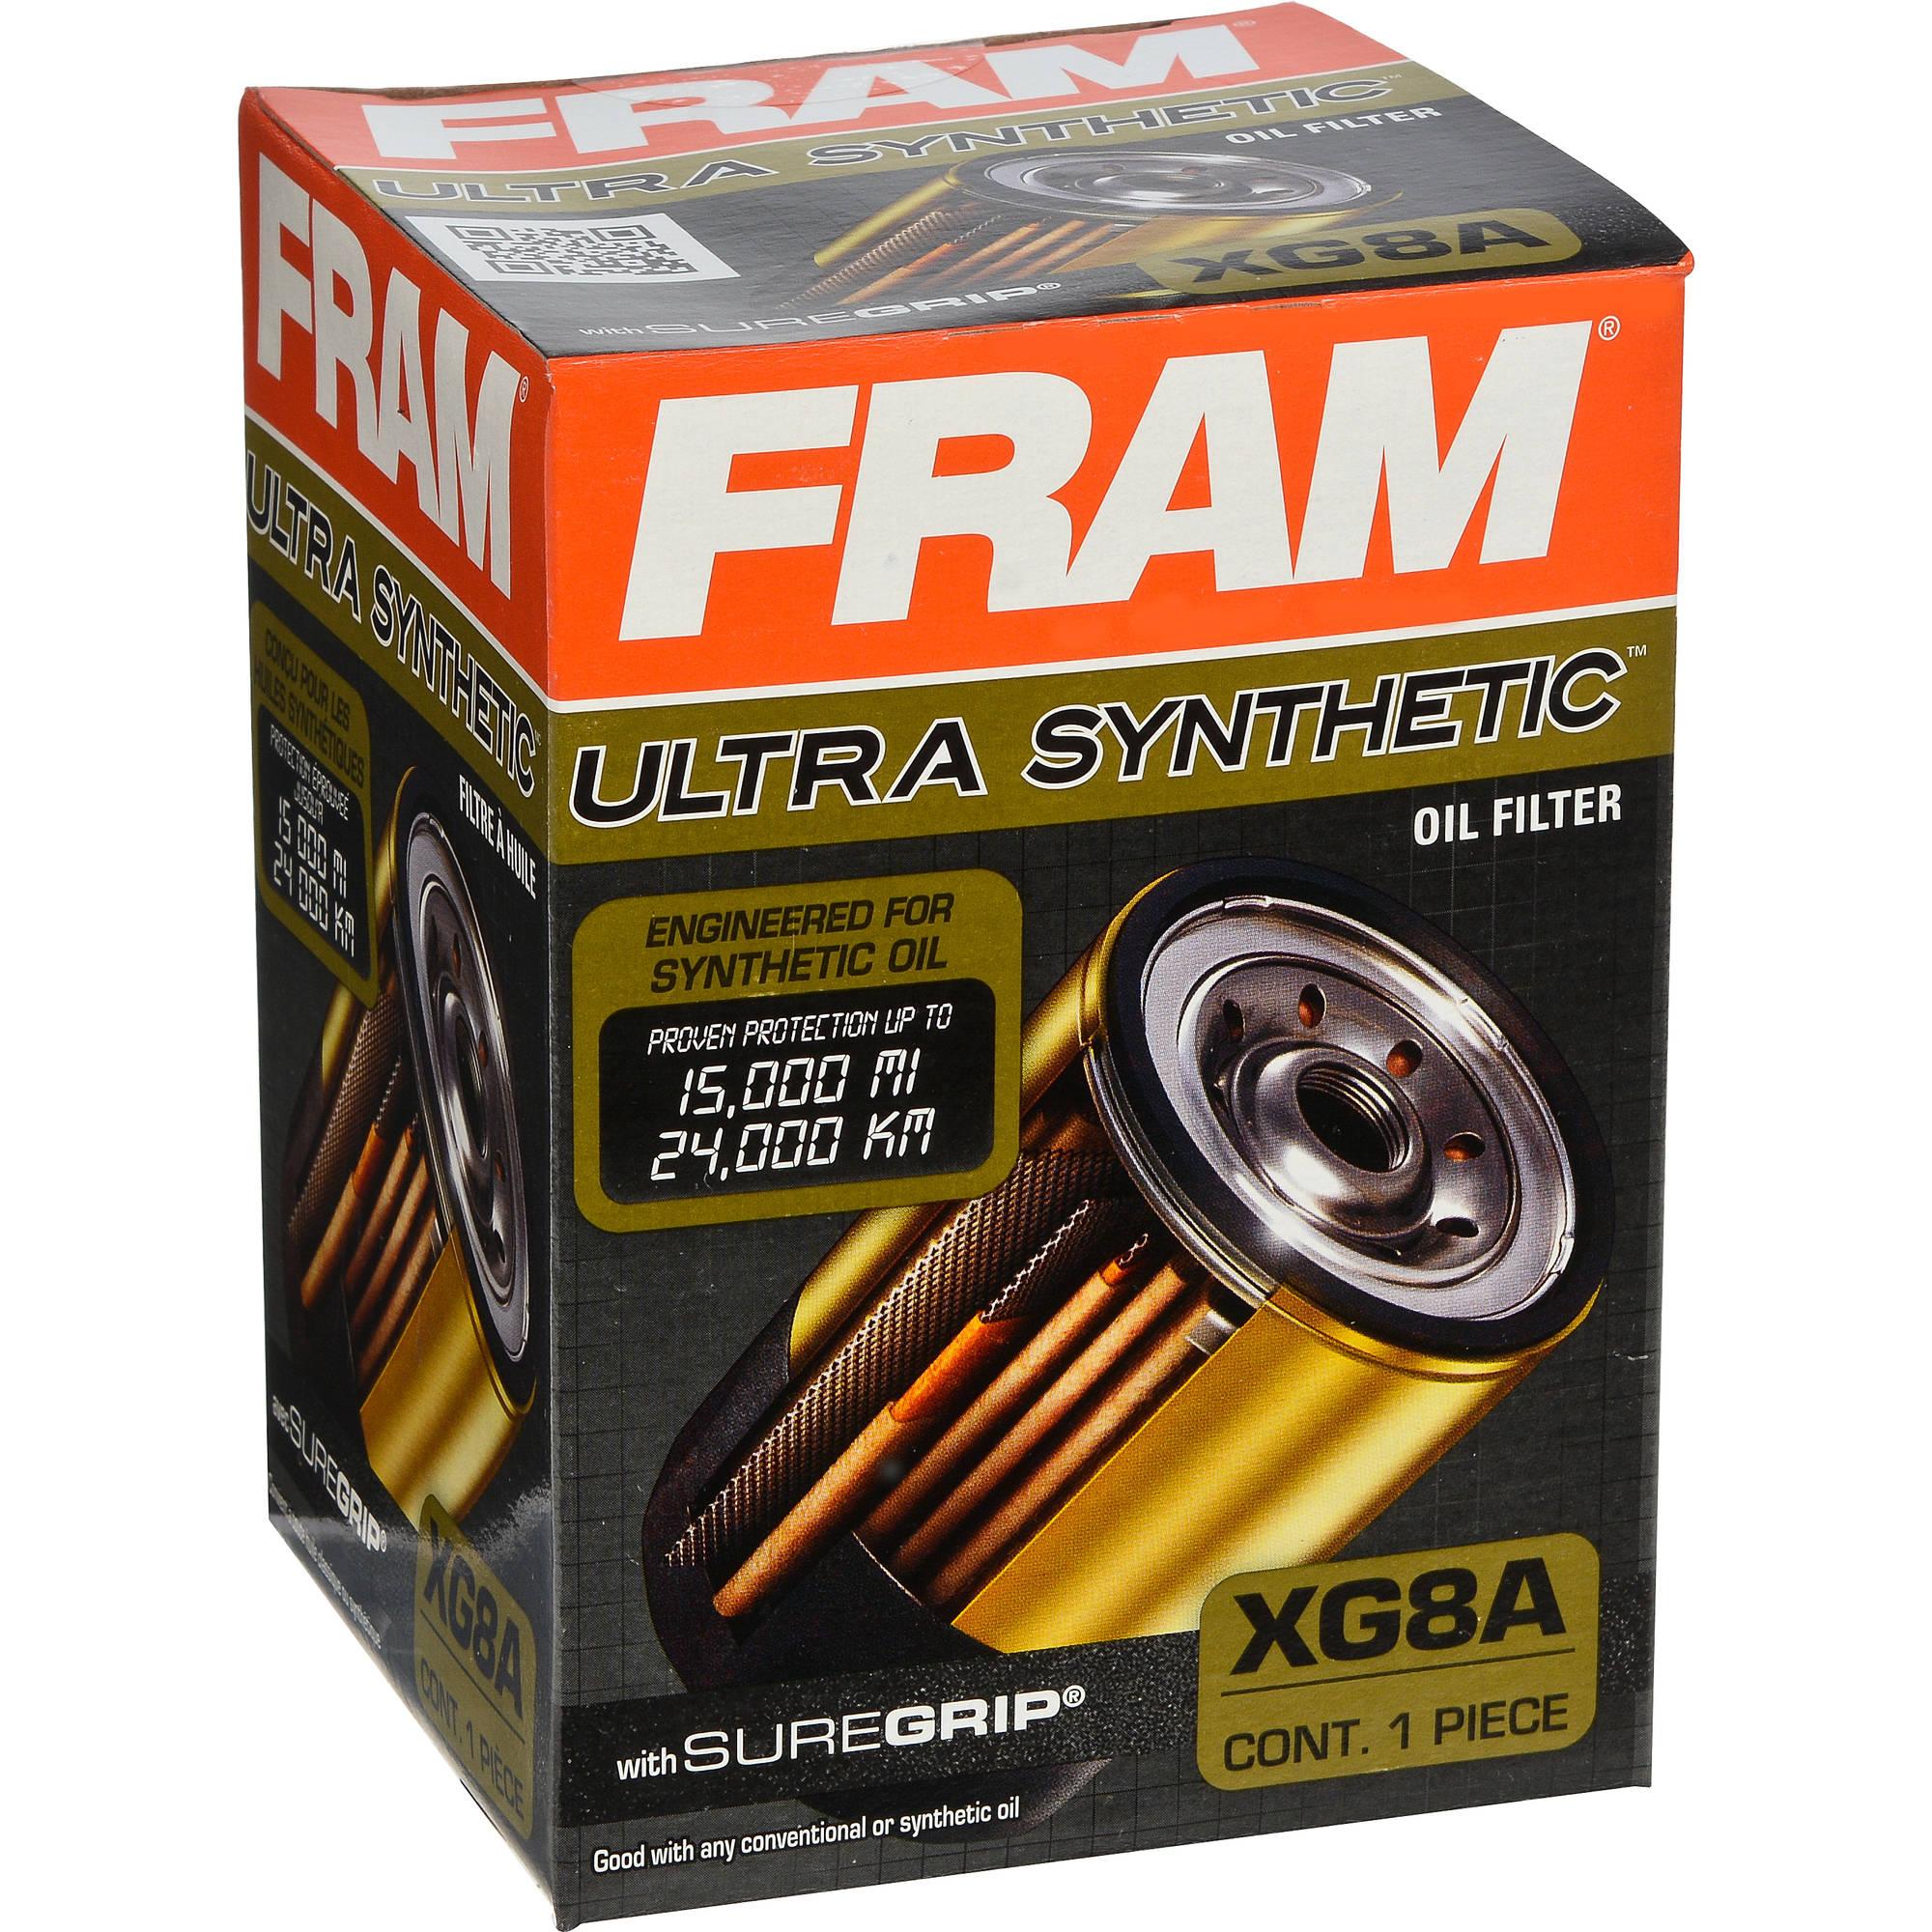 FRAM Ultra Synthetic Oil Filter, XG8A